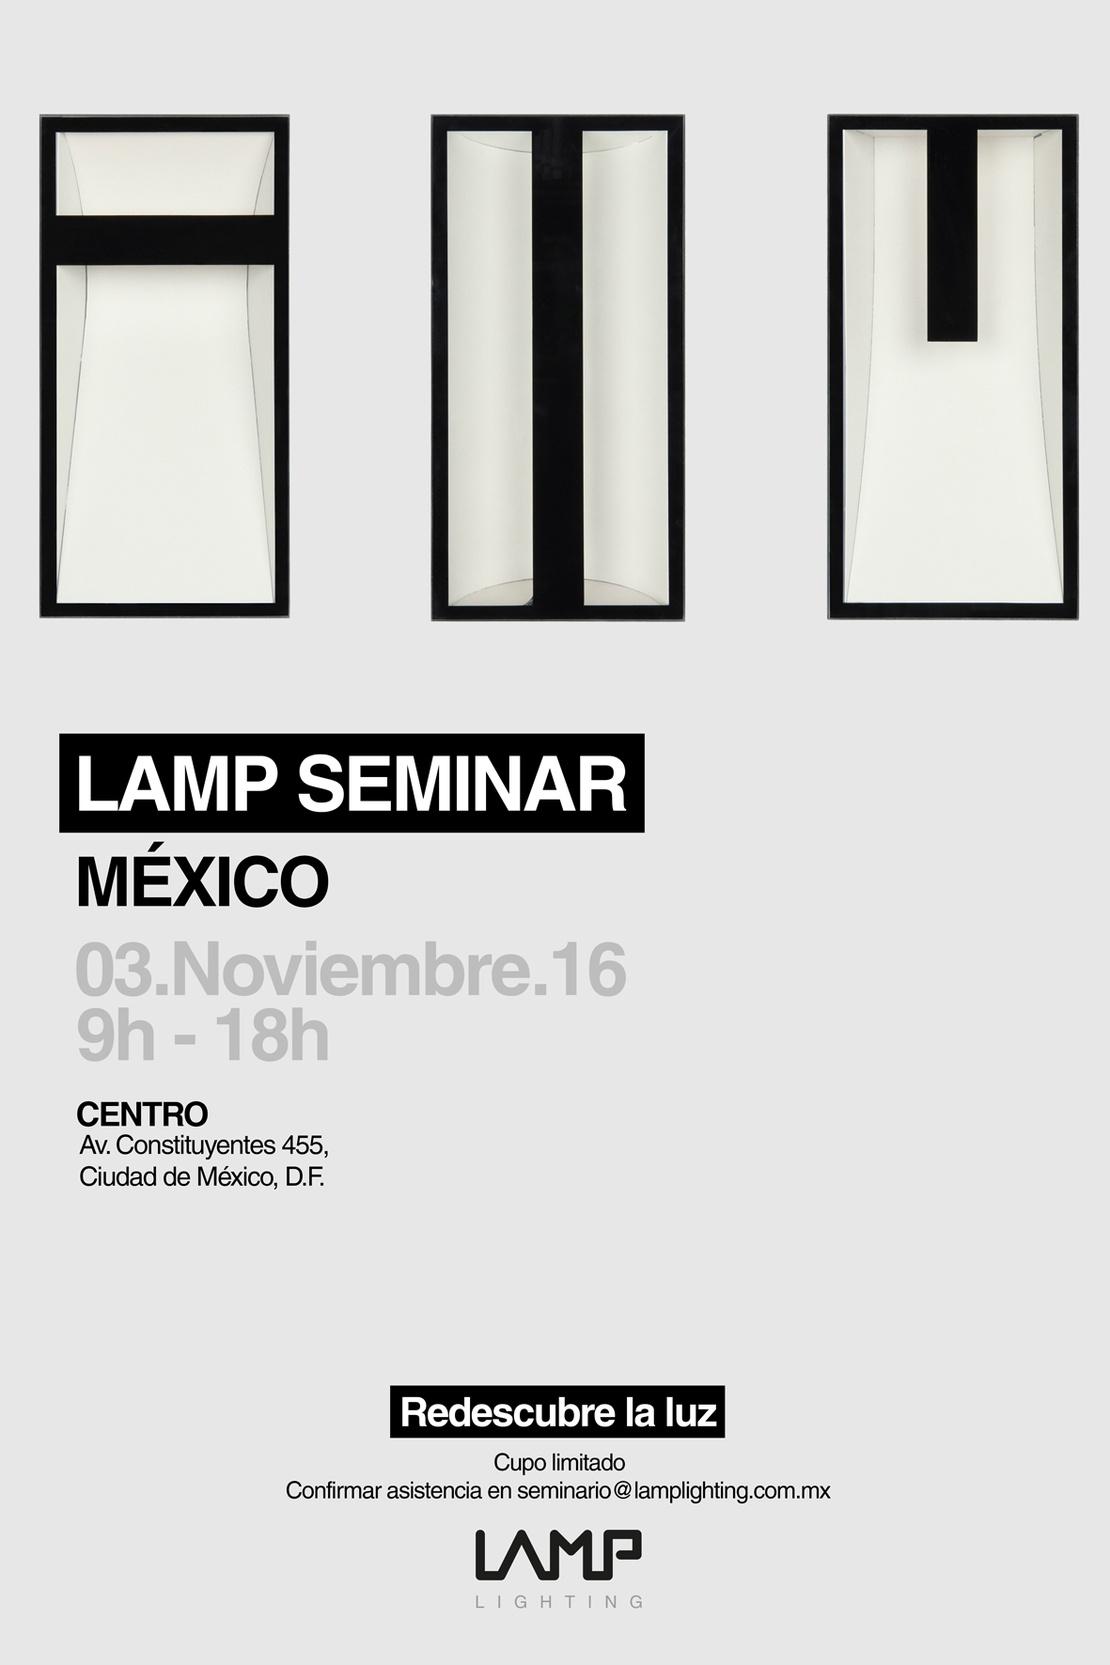 lamp seminar mexico 03